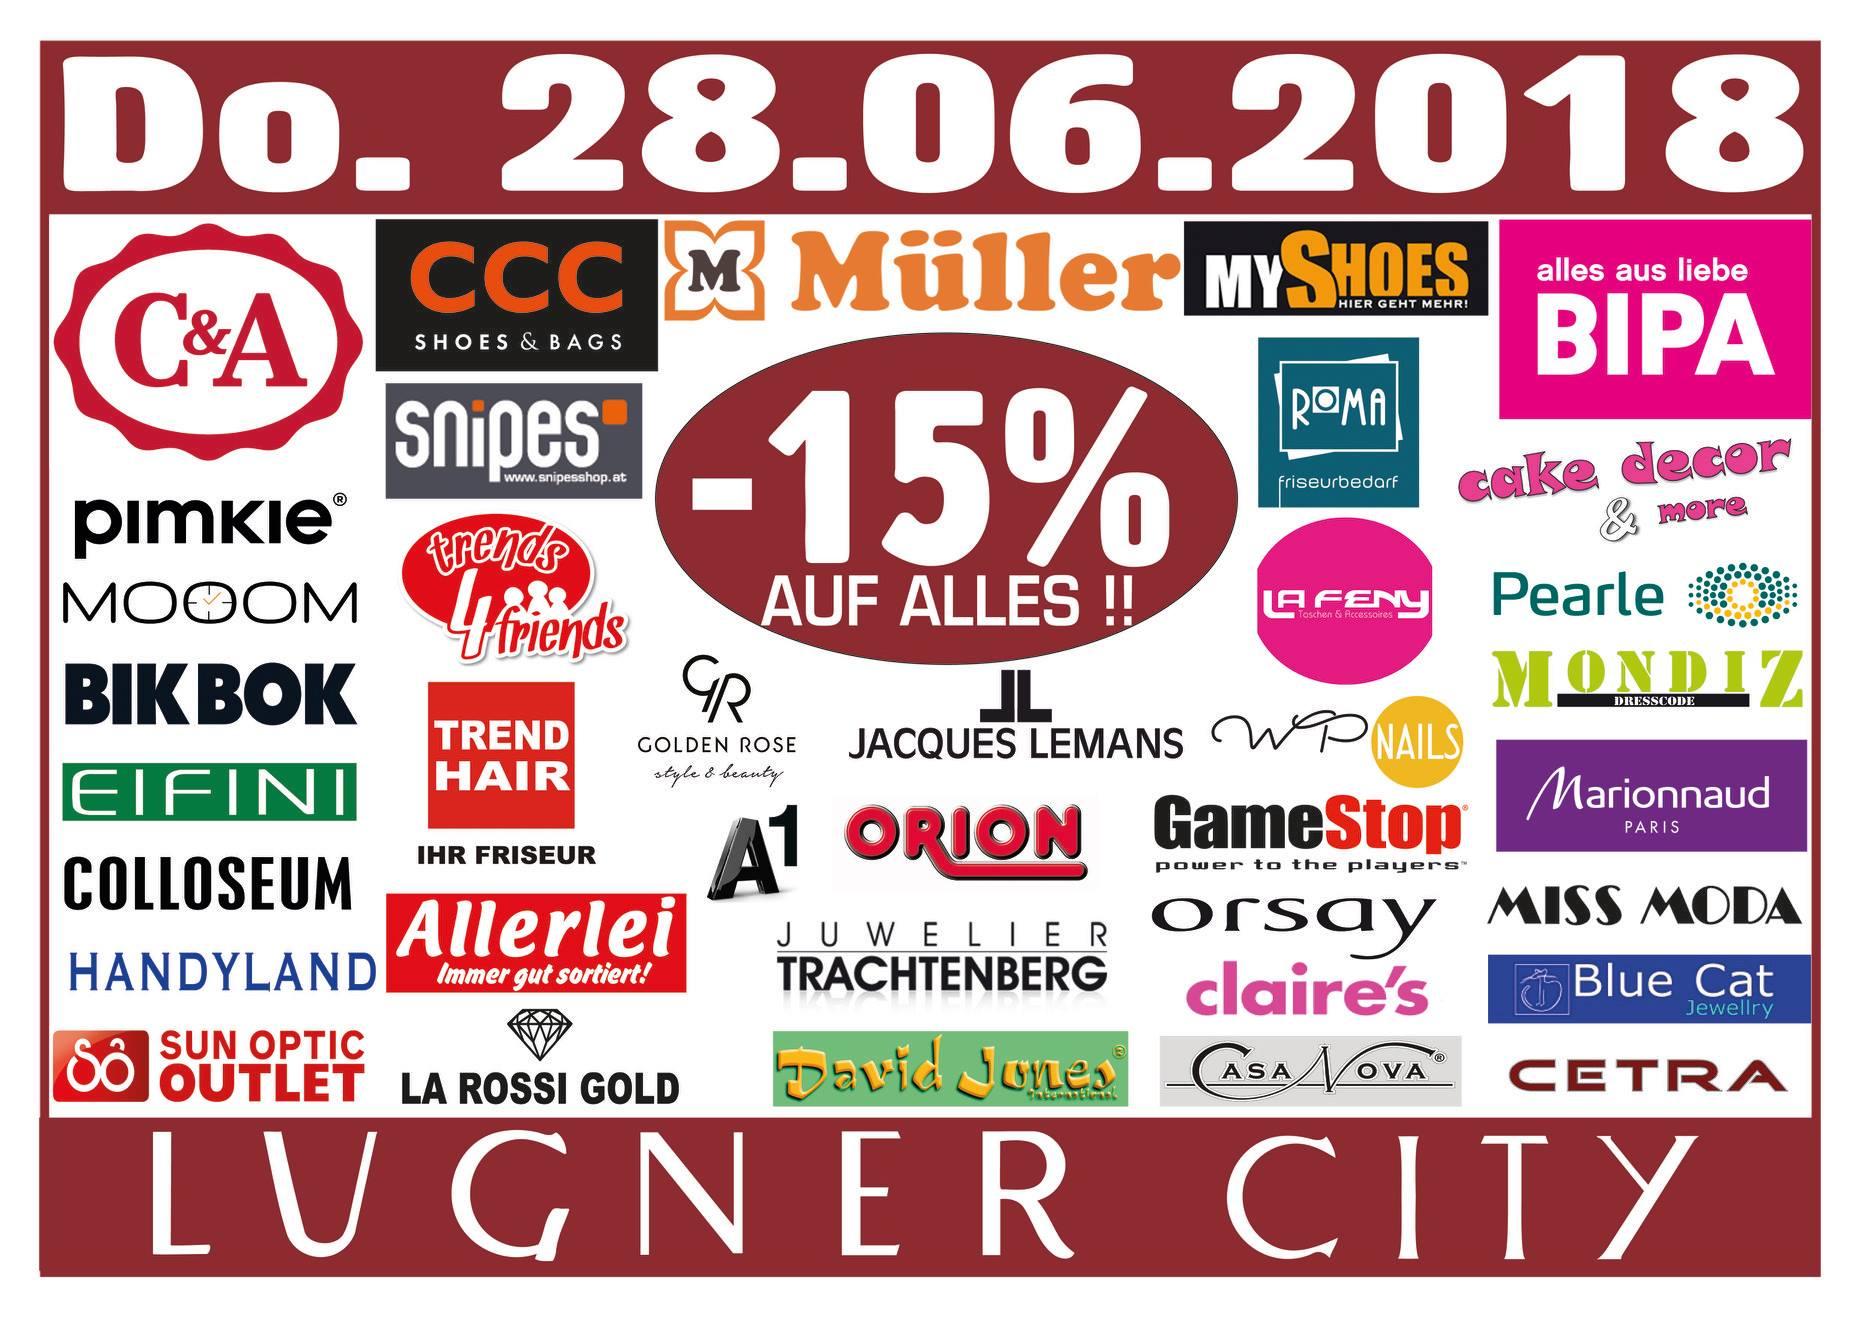 Lugner City: 15% Rabatt in vielen Shops - nur am 28. Juni